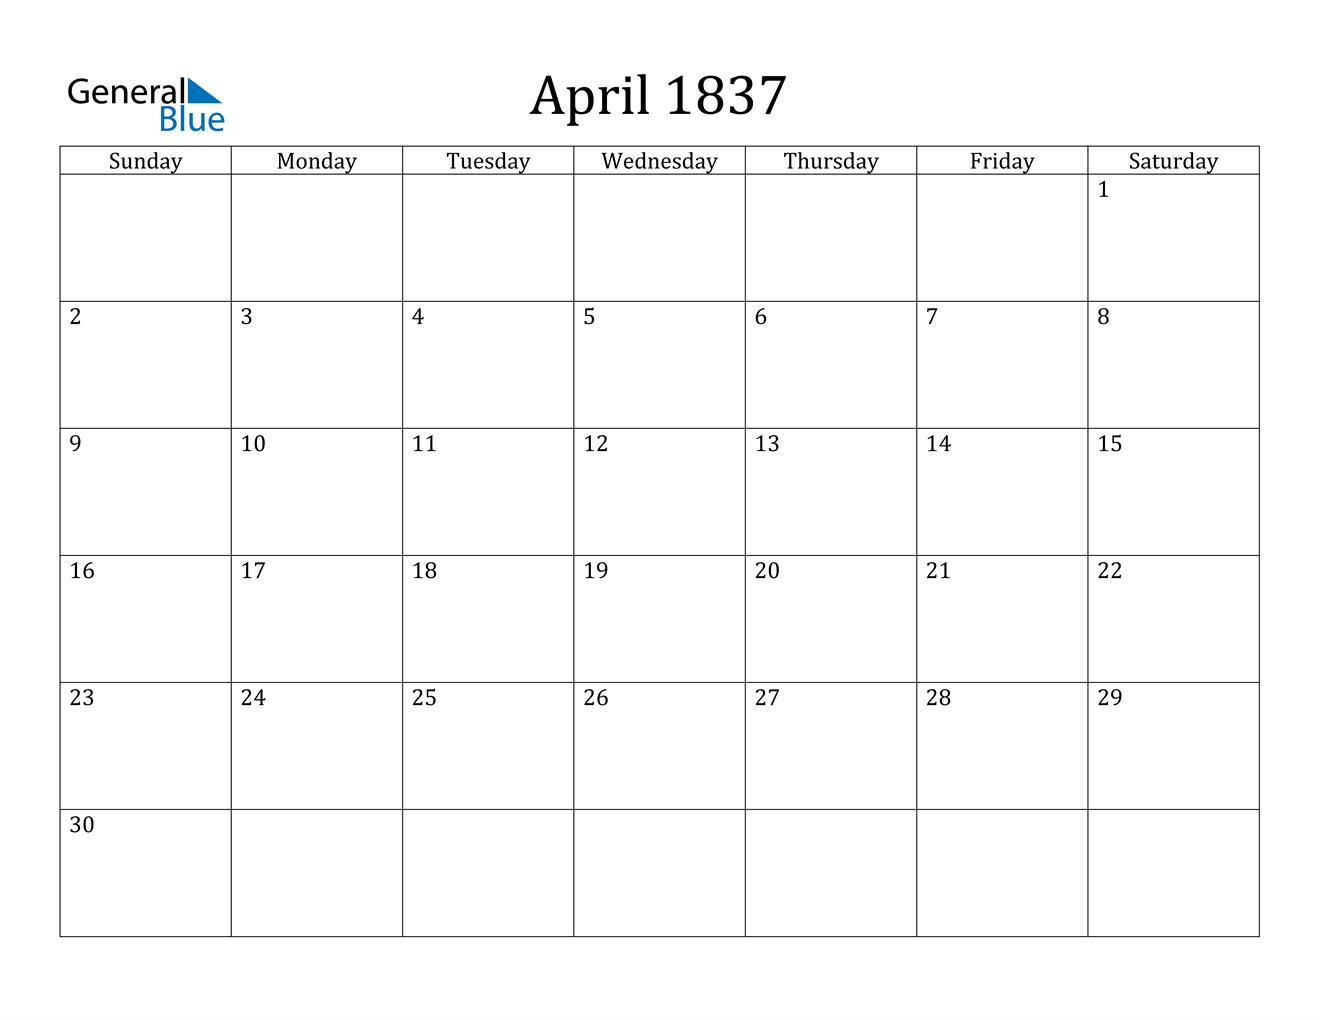 Image of April 1837 Calendar